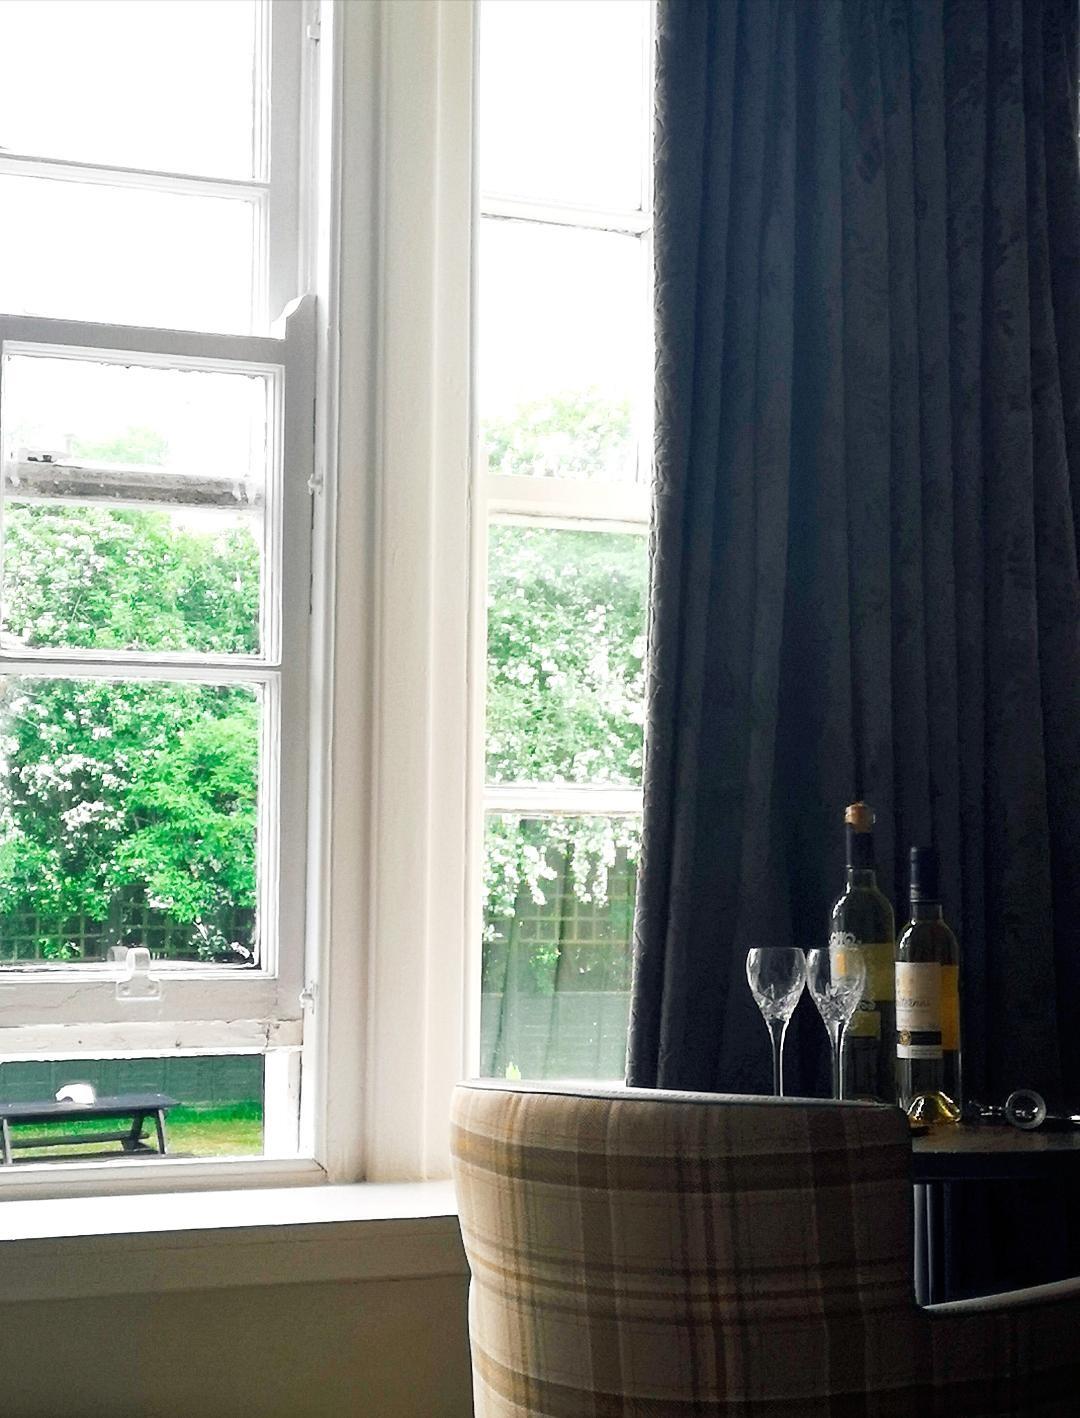 table window view.jpg